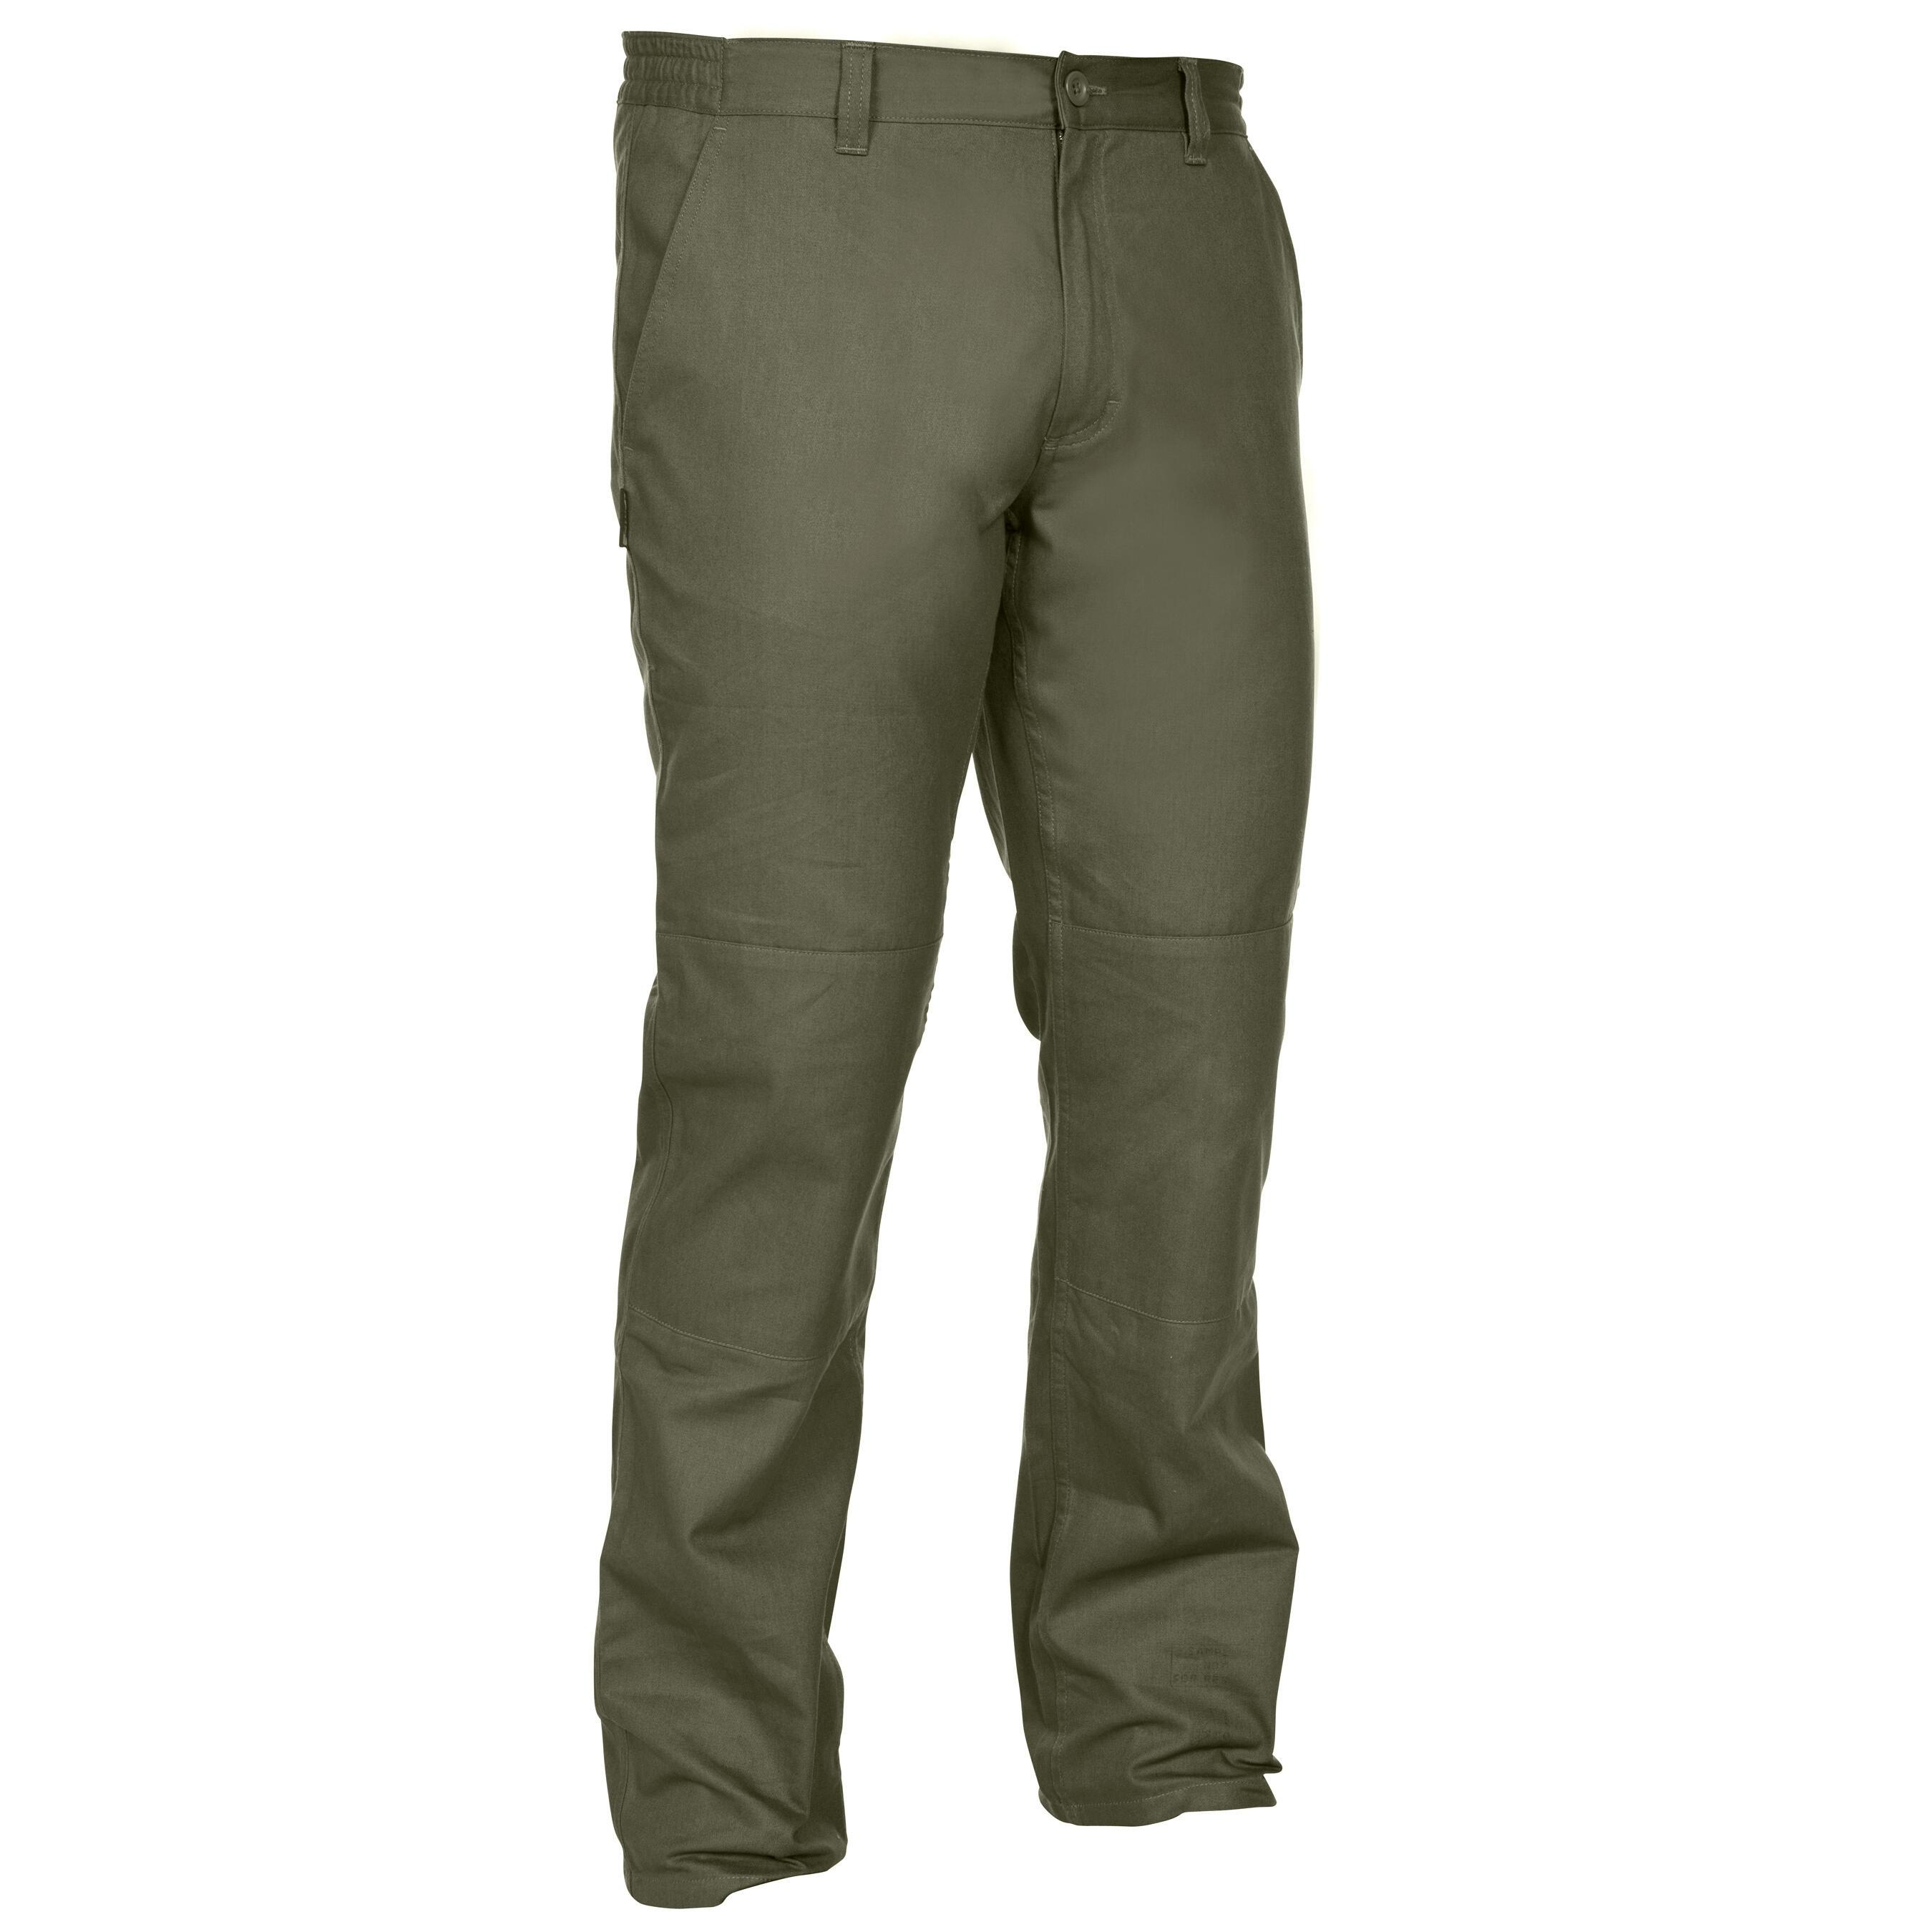 Jagdhose Steppe 100 grün   Sportbekleidung > Sporthosen > Trekkinghosen   Solognac